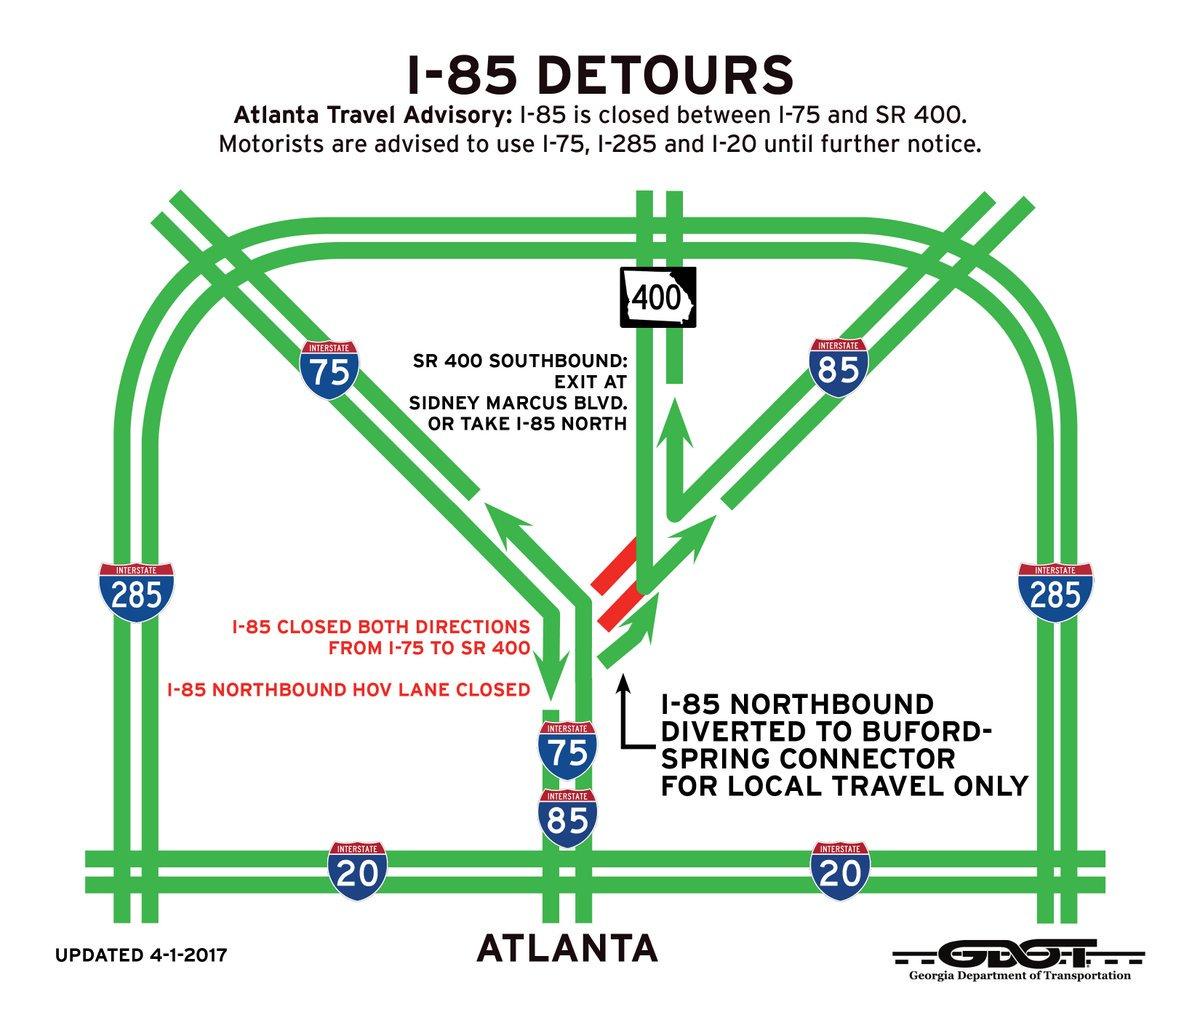 I 85 Collapse Atlanta Map.Atlanta I 85 Collapse Map Detours Road Closures And Alternative